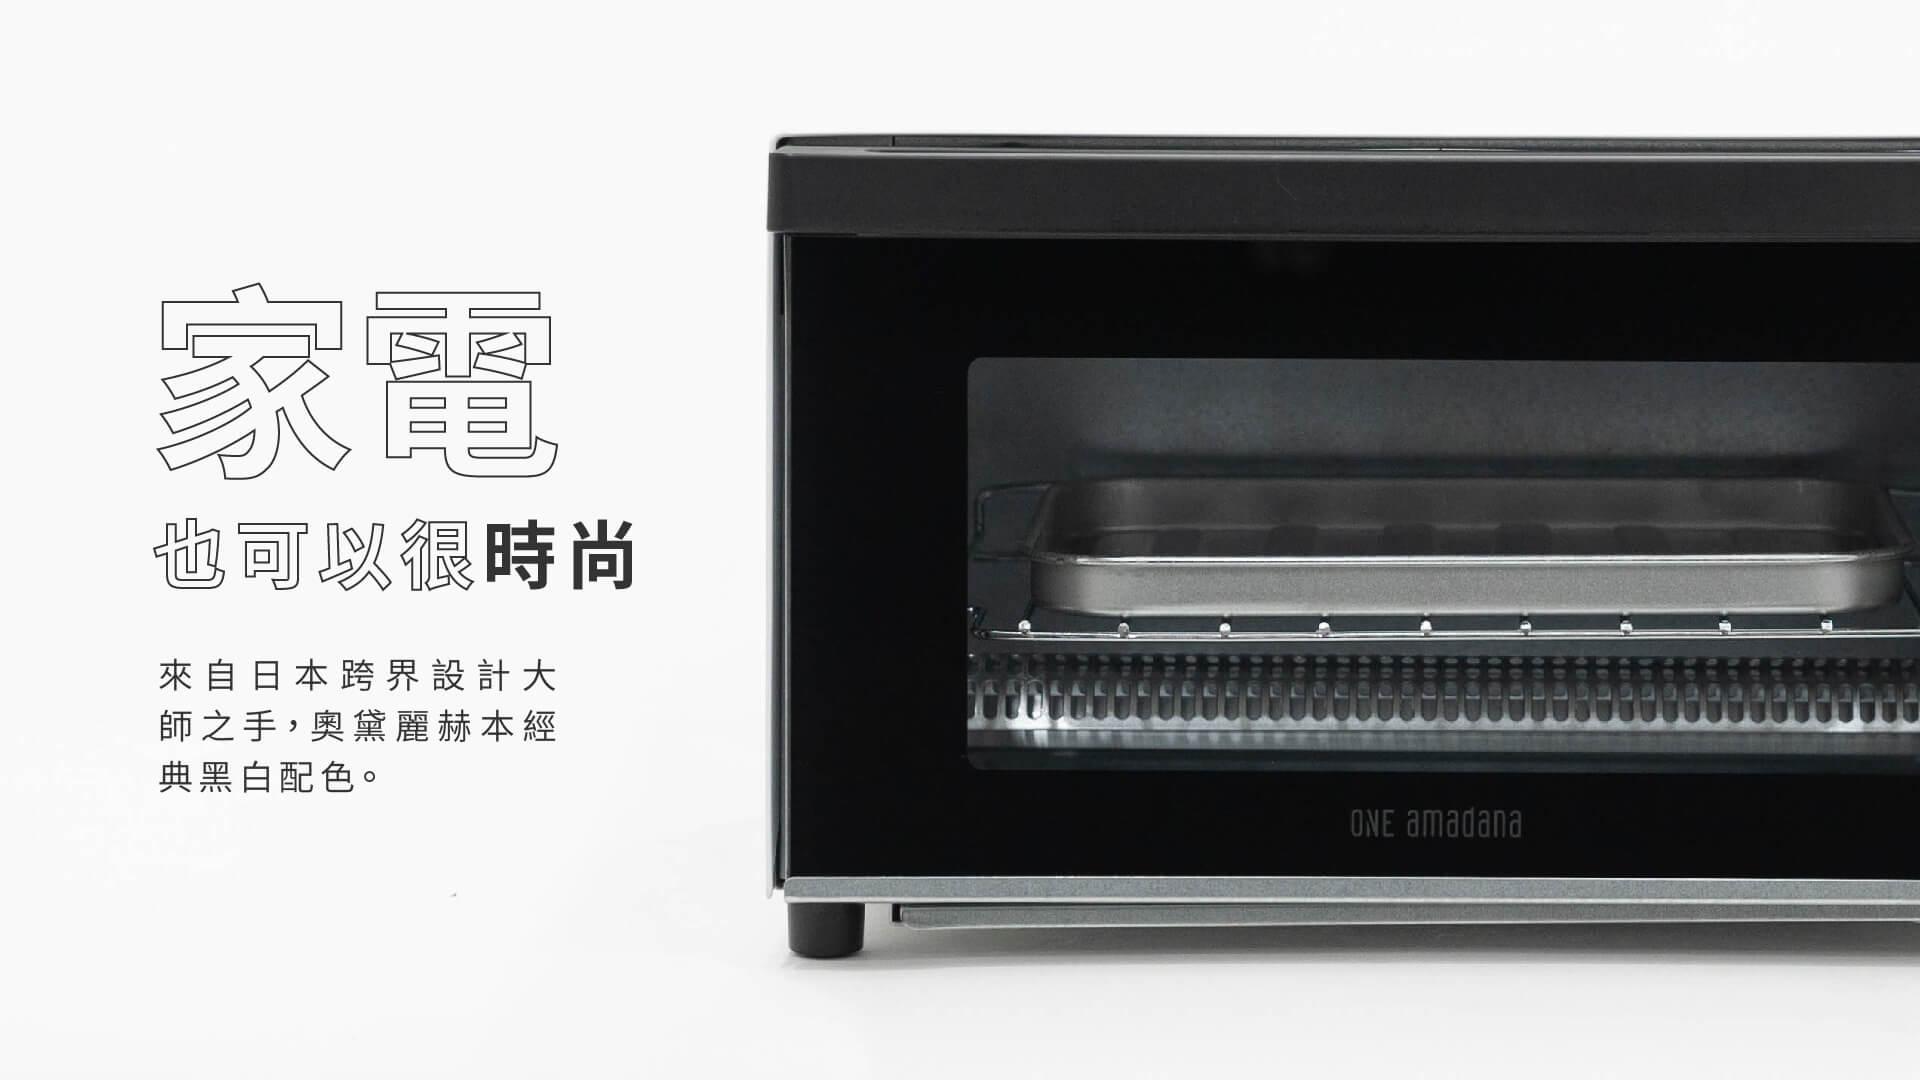 ONE amadana 經典復古烤箱 4